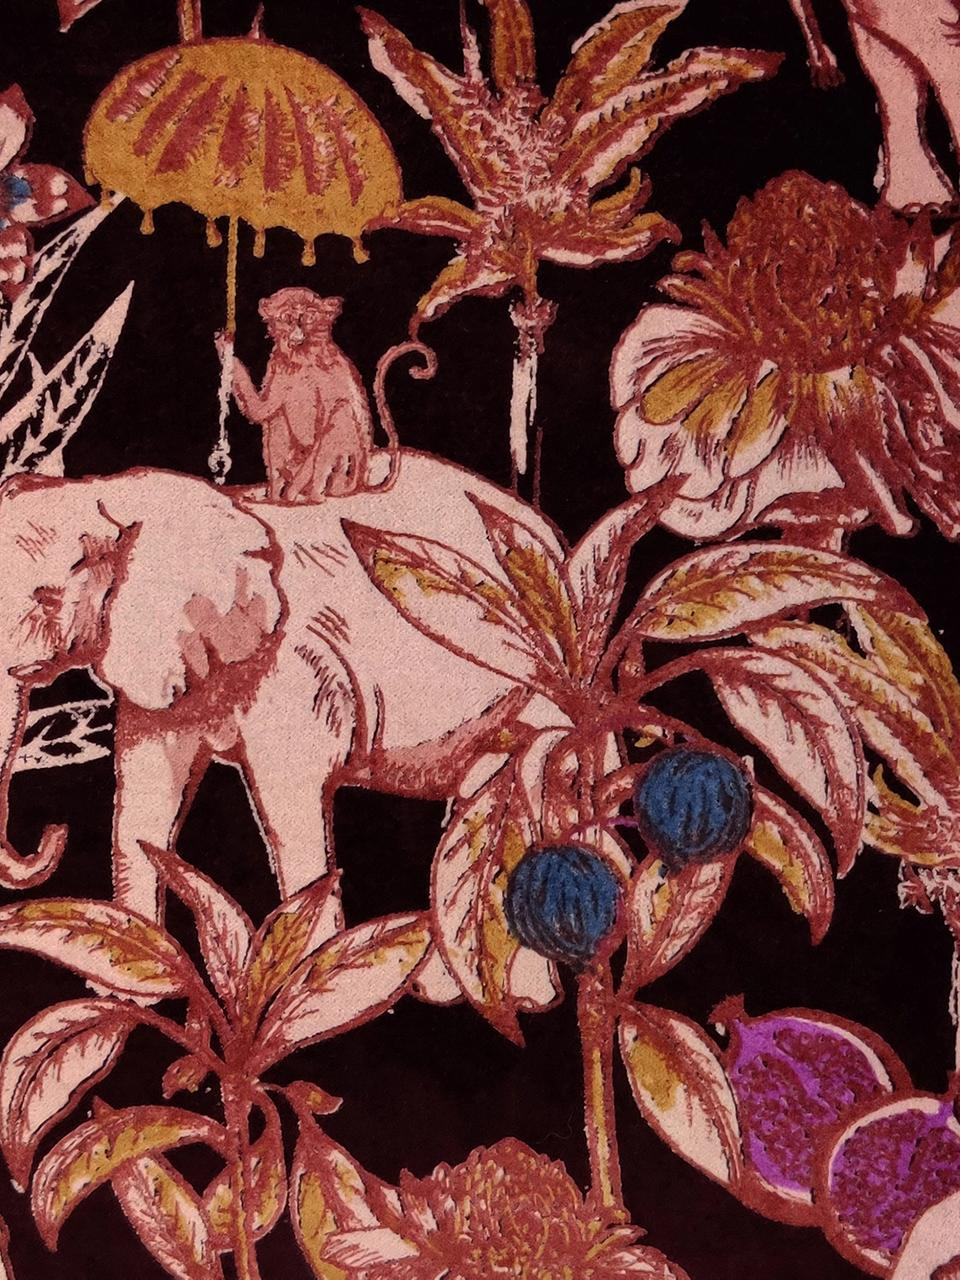 Cuscino con imbottitura Elephant, Rivestimento: 100% cotone, Rosso bordeaux, multicolore, Larg. 45 x Lung. 45 cm